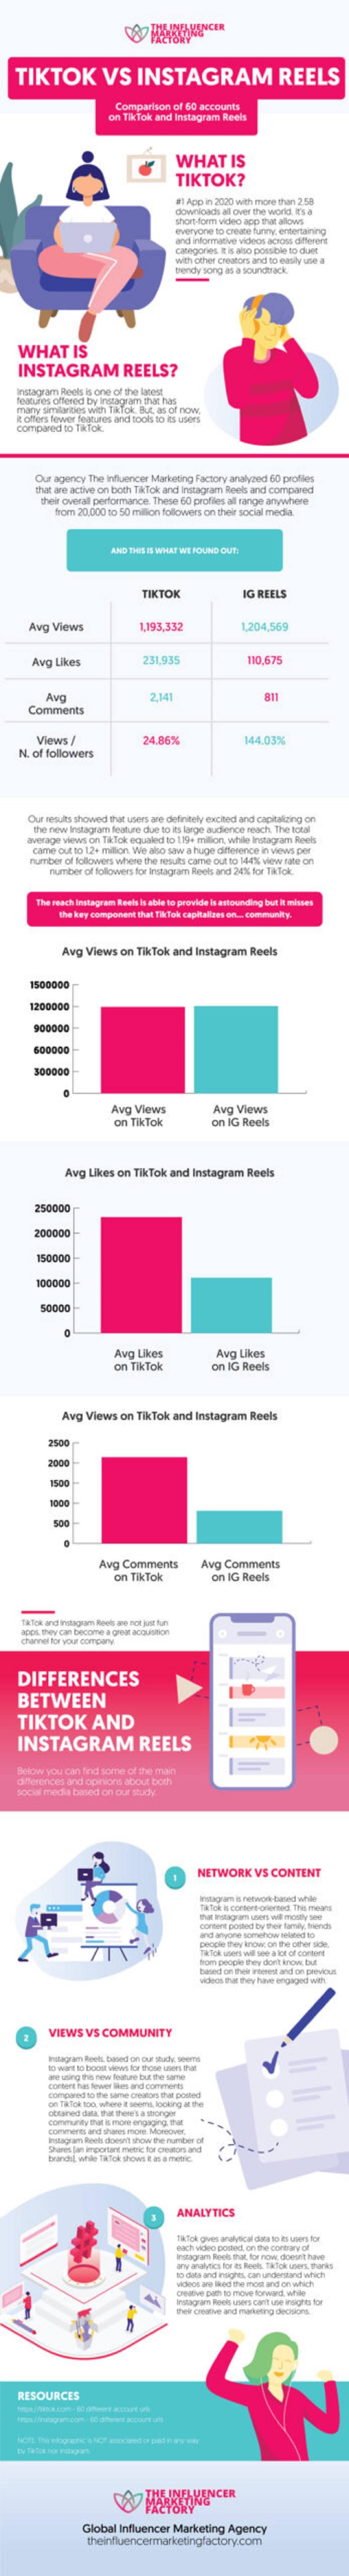 tiktok-vs-instagram-reels-infographic